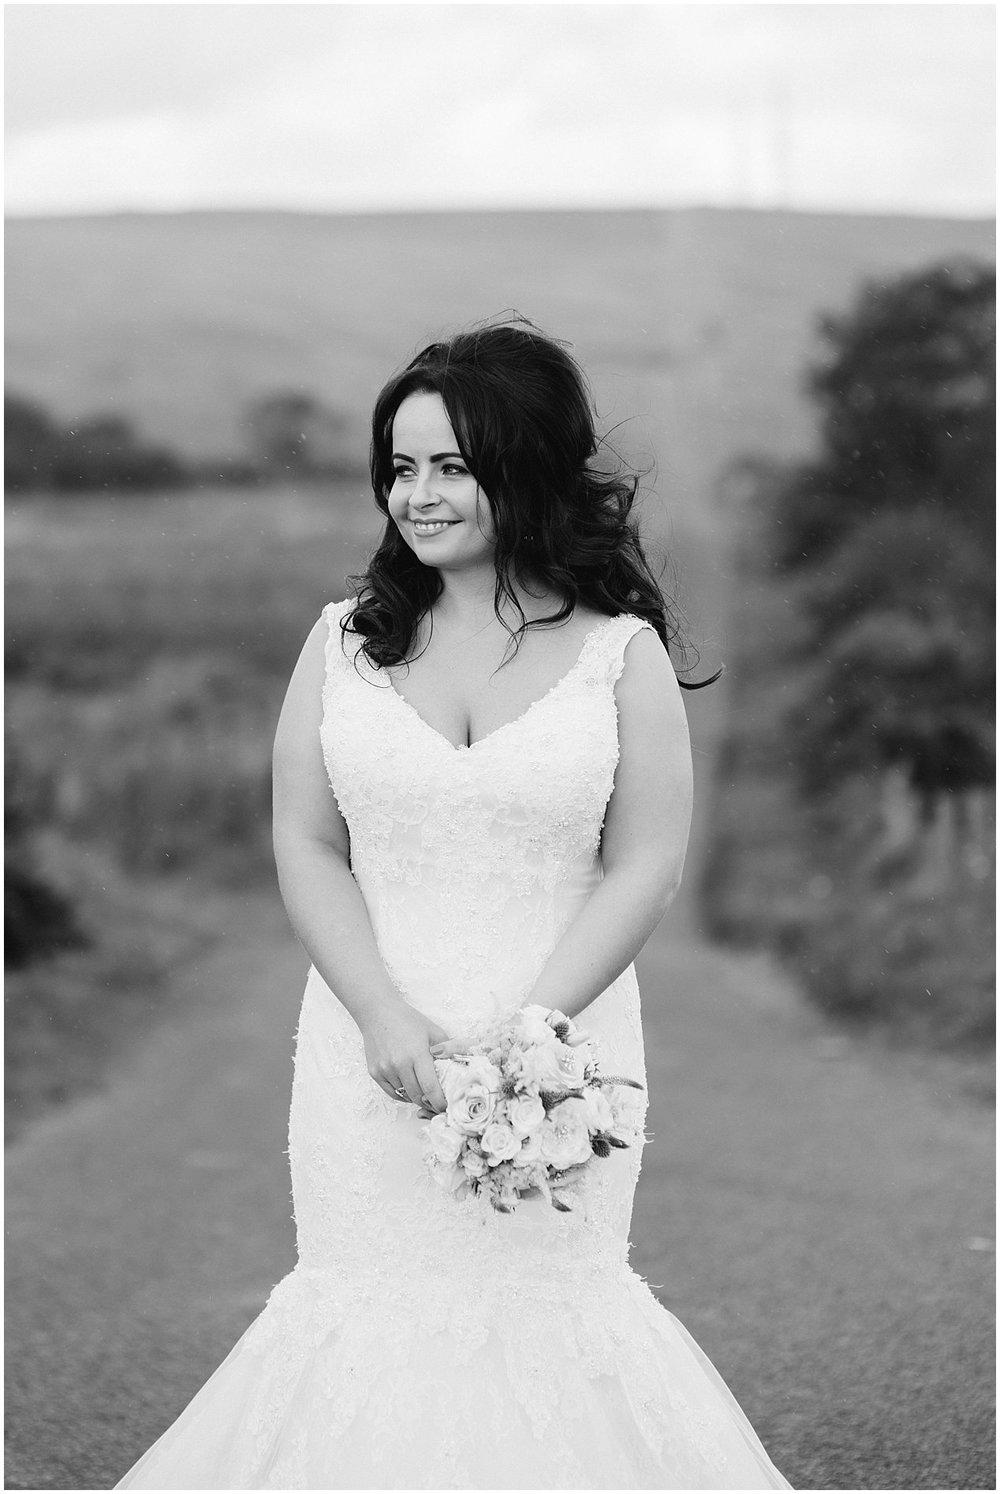 Shauneen_PJ_Hillgrove_Hotel_Monaghan_Wedding_jude_browne_photography_0064.jpg